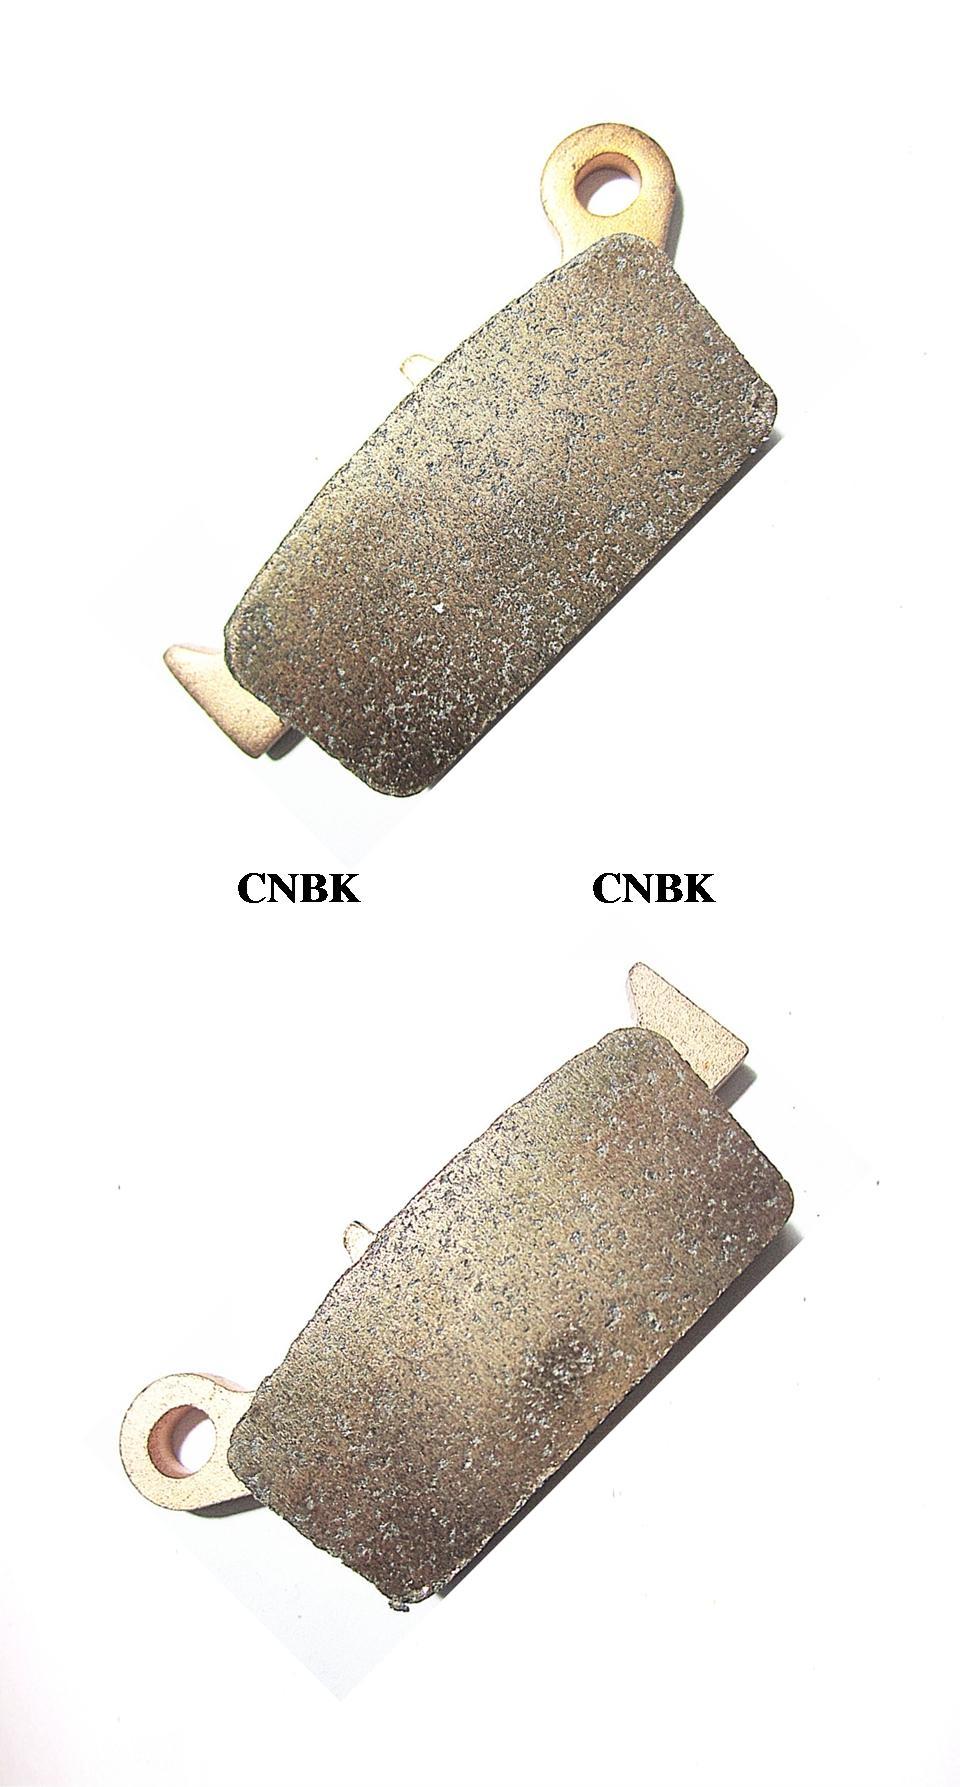 02 03 04 05 06 07 Sinter Rear Disc Brake Pads fit KAWASAKI 125 KX KX125 1995 - 2008 CNBK(China (Mainland))